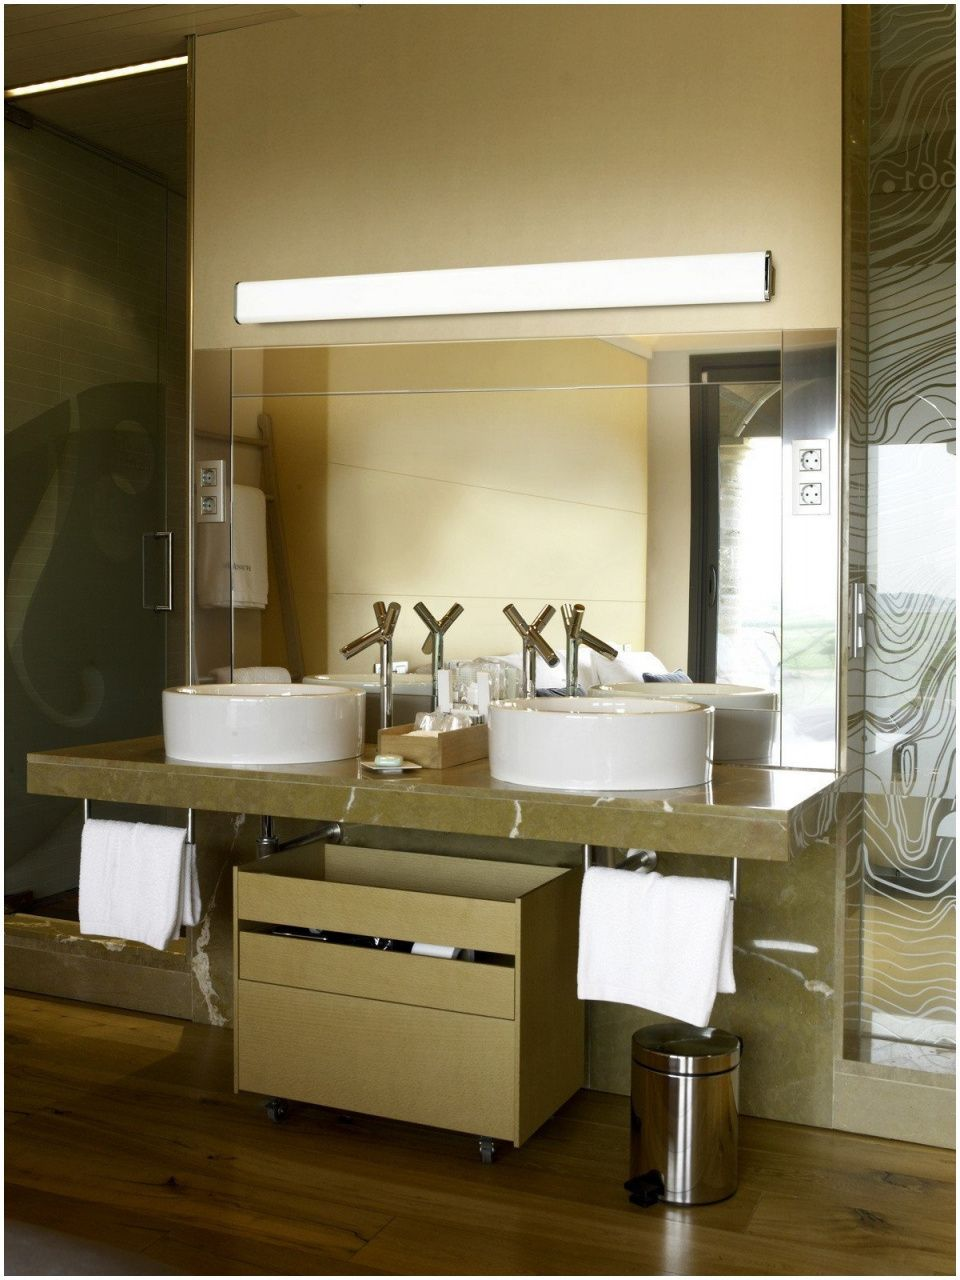 15 Eclairage Salle De Bain Ikea  Eclairage salle de bain, Lumiere